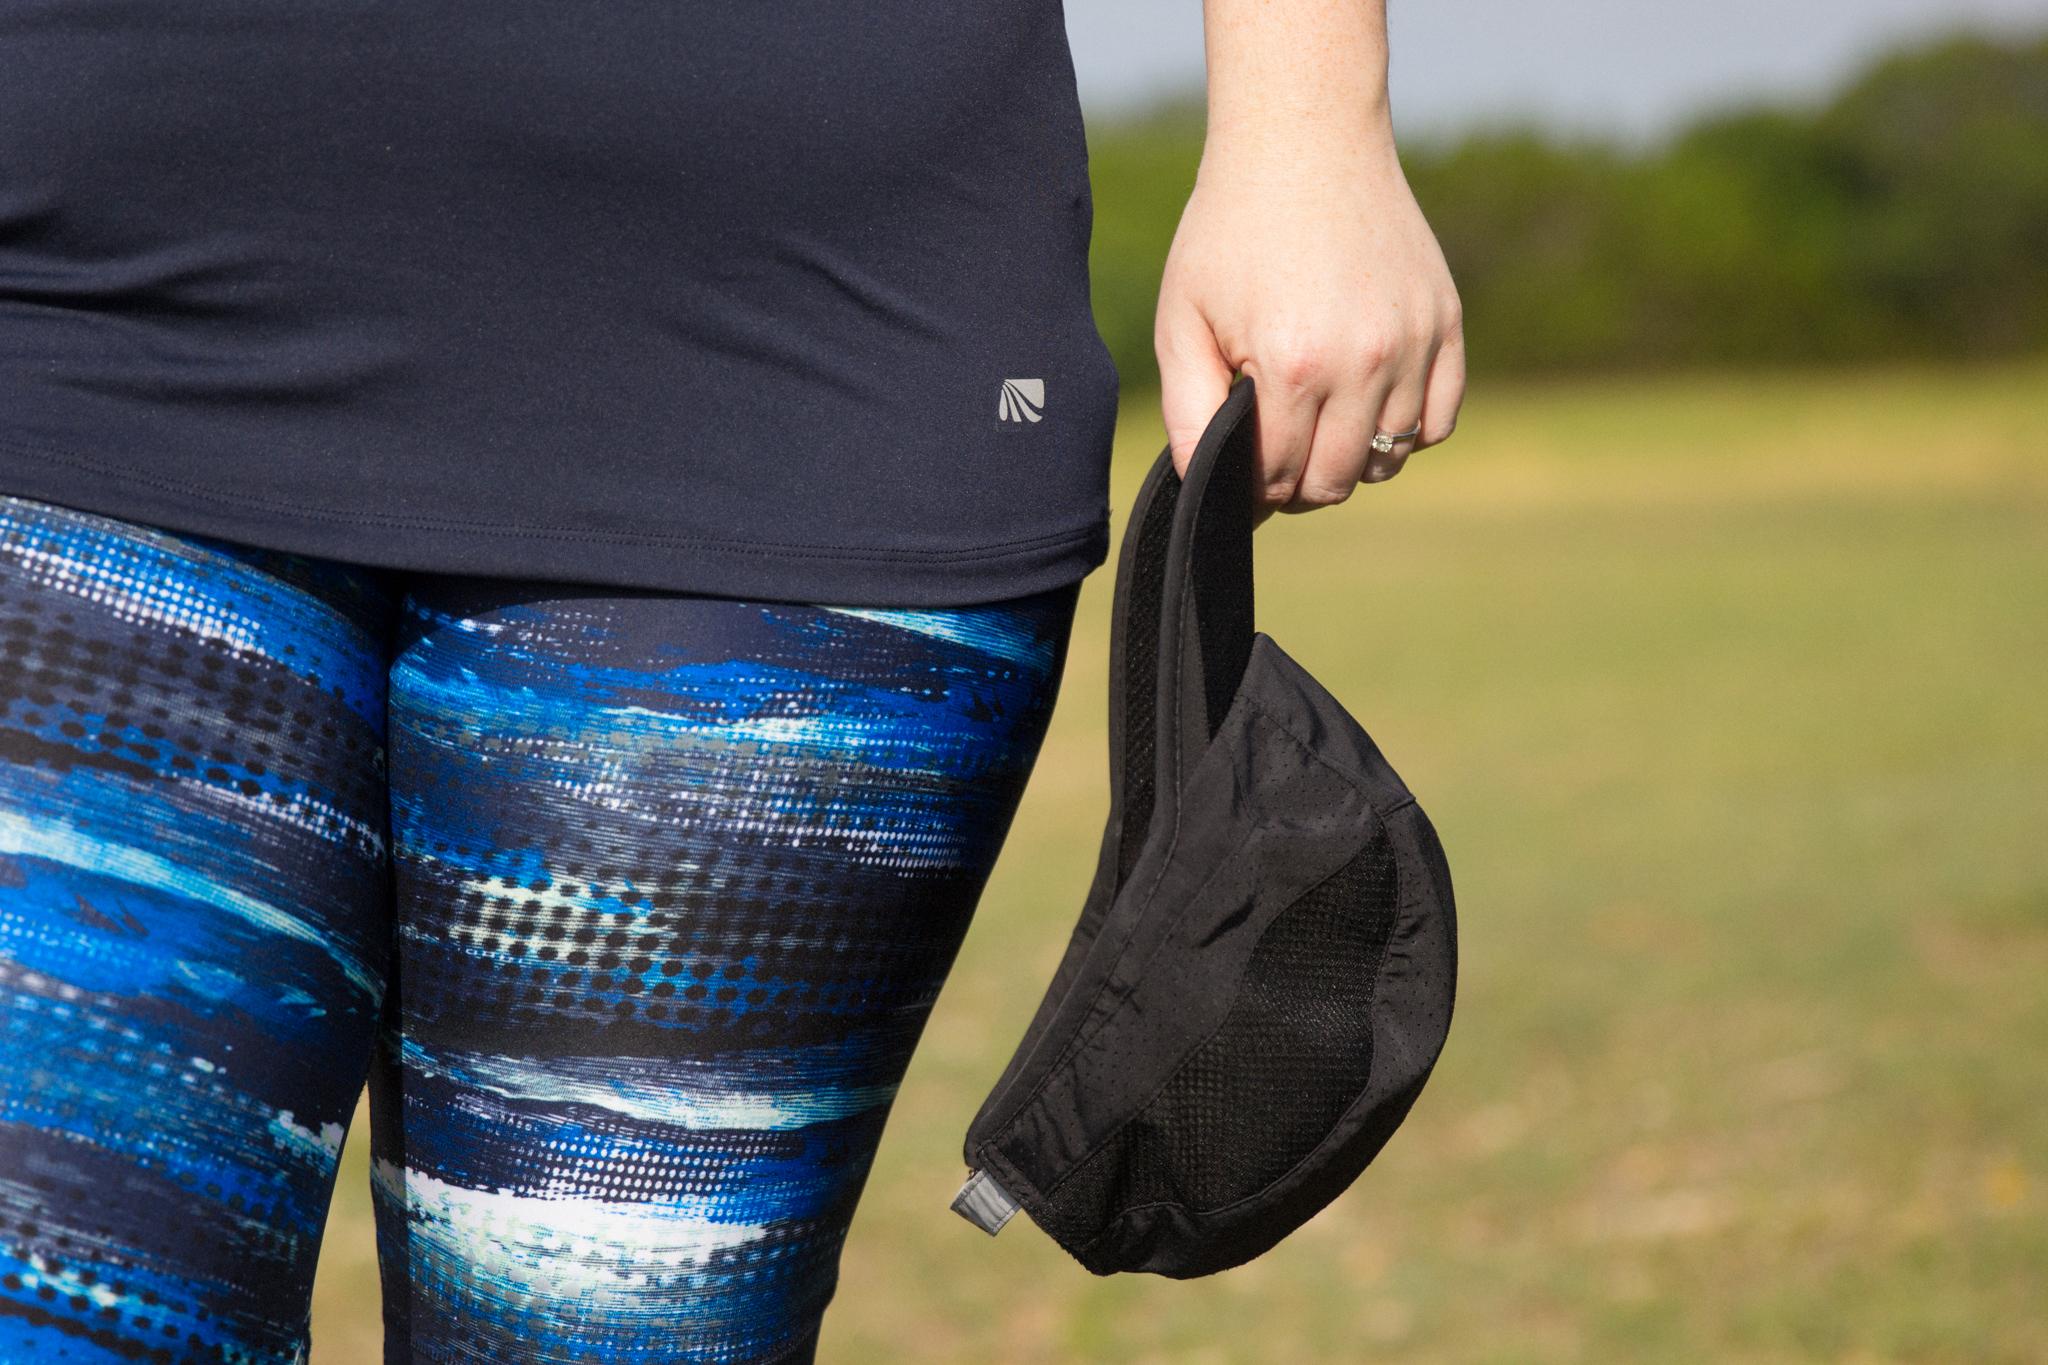 Ellie-Activewear-June-Box-Unboxing-the-Glam-6.jpg